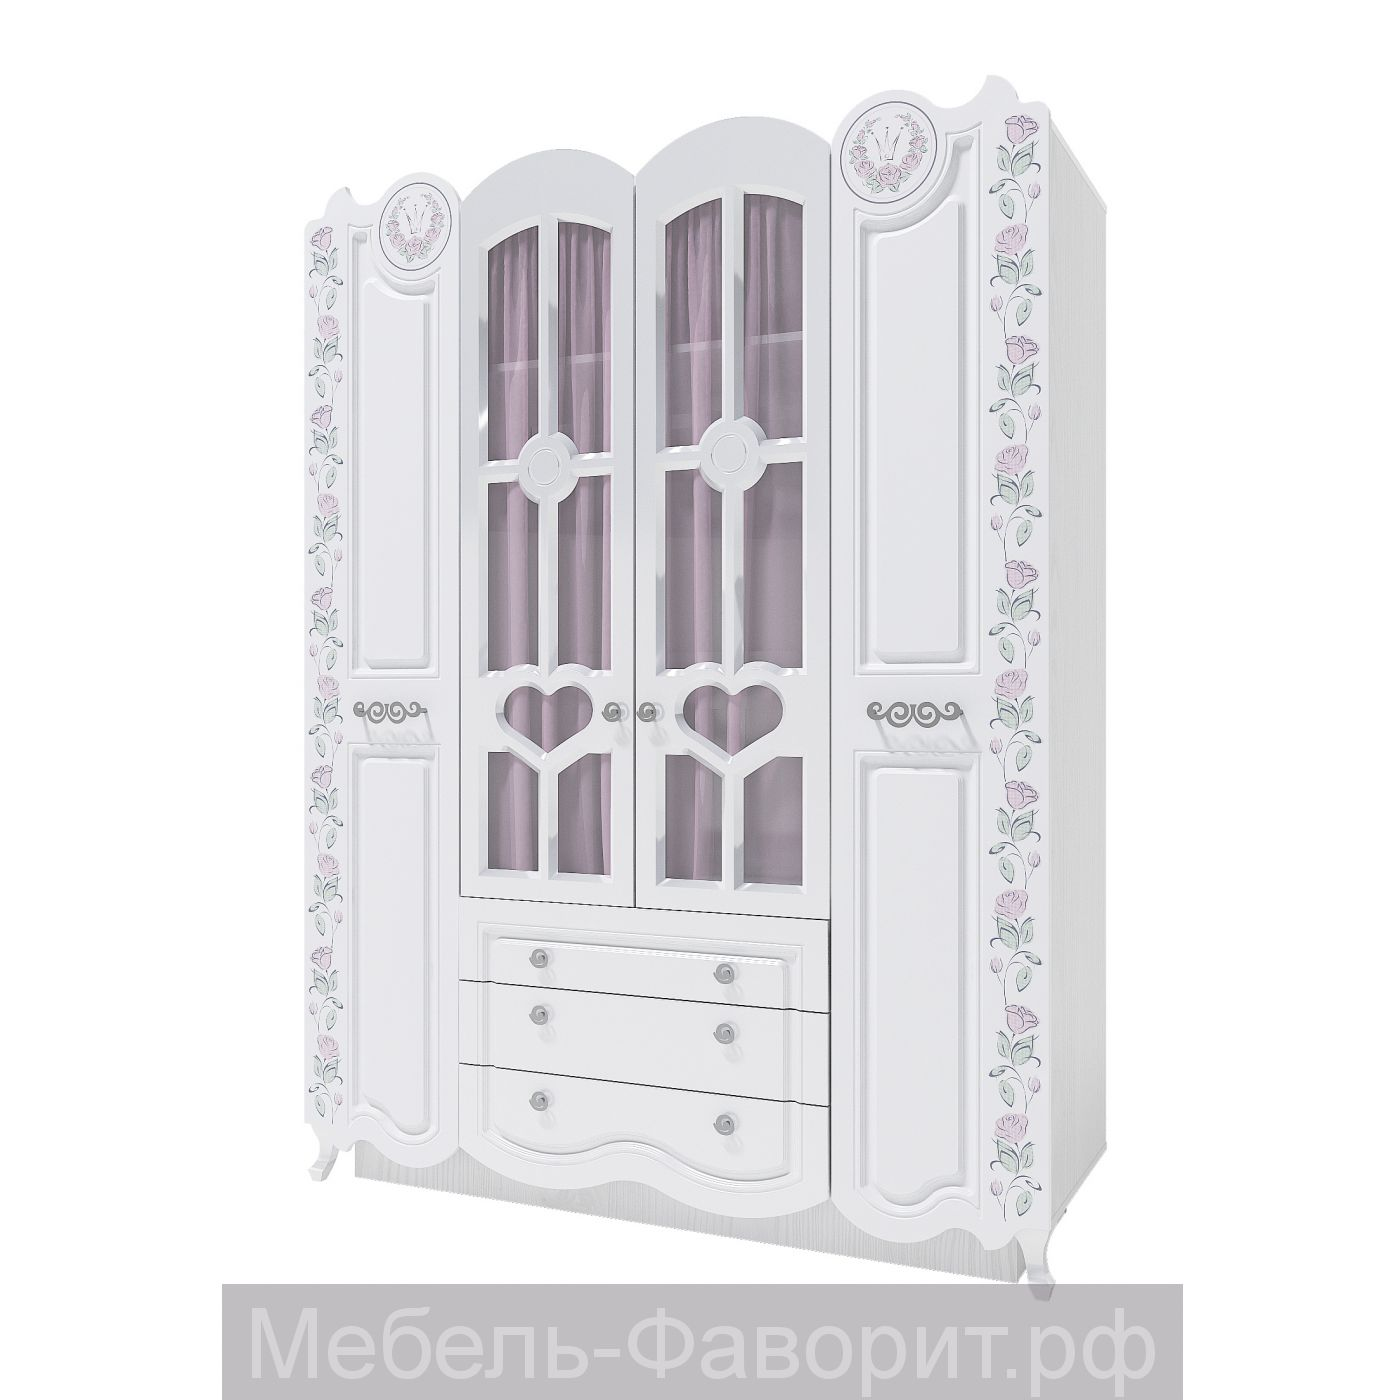 Розалия-24 шкаф 4-х створчатый